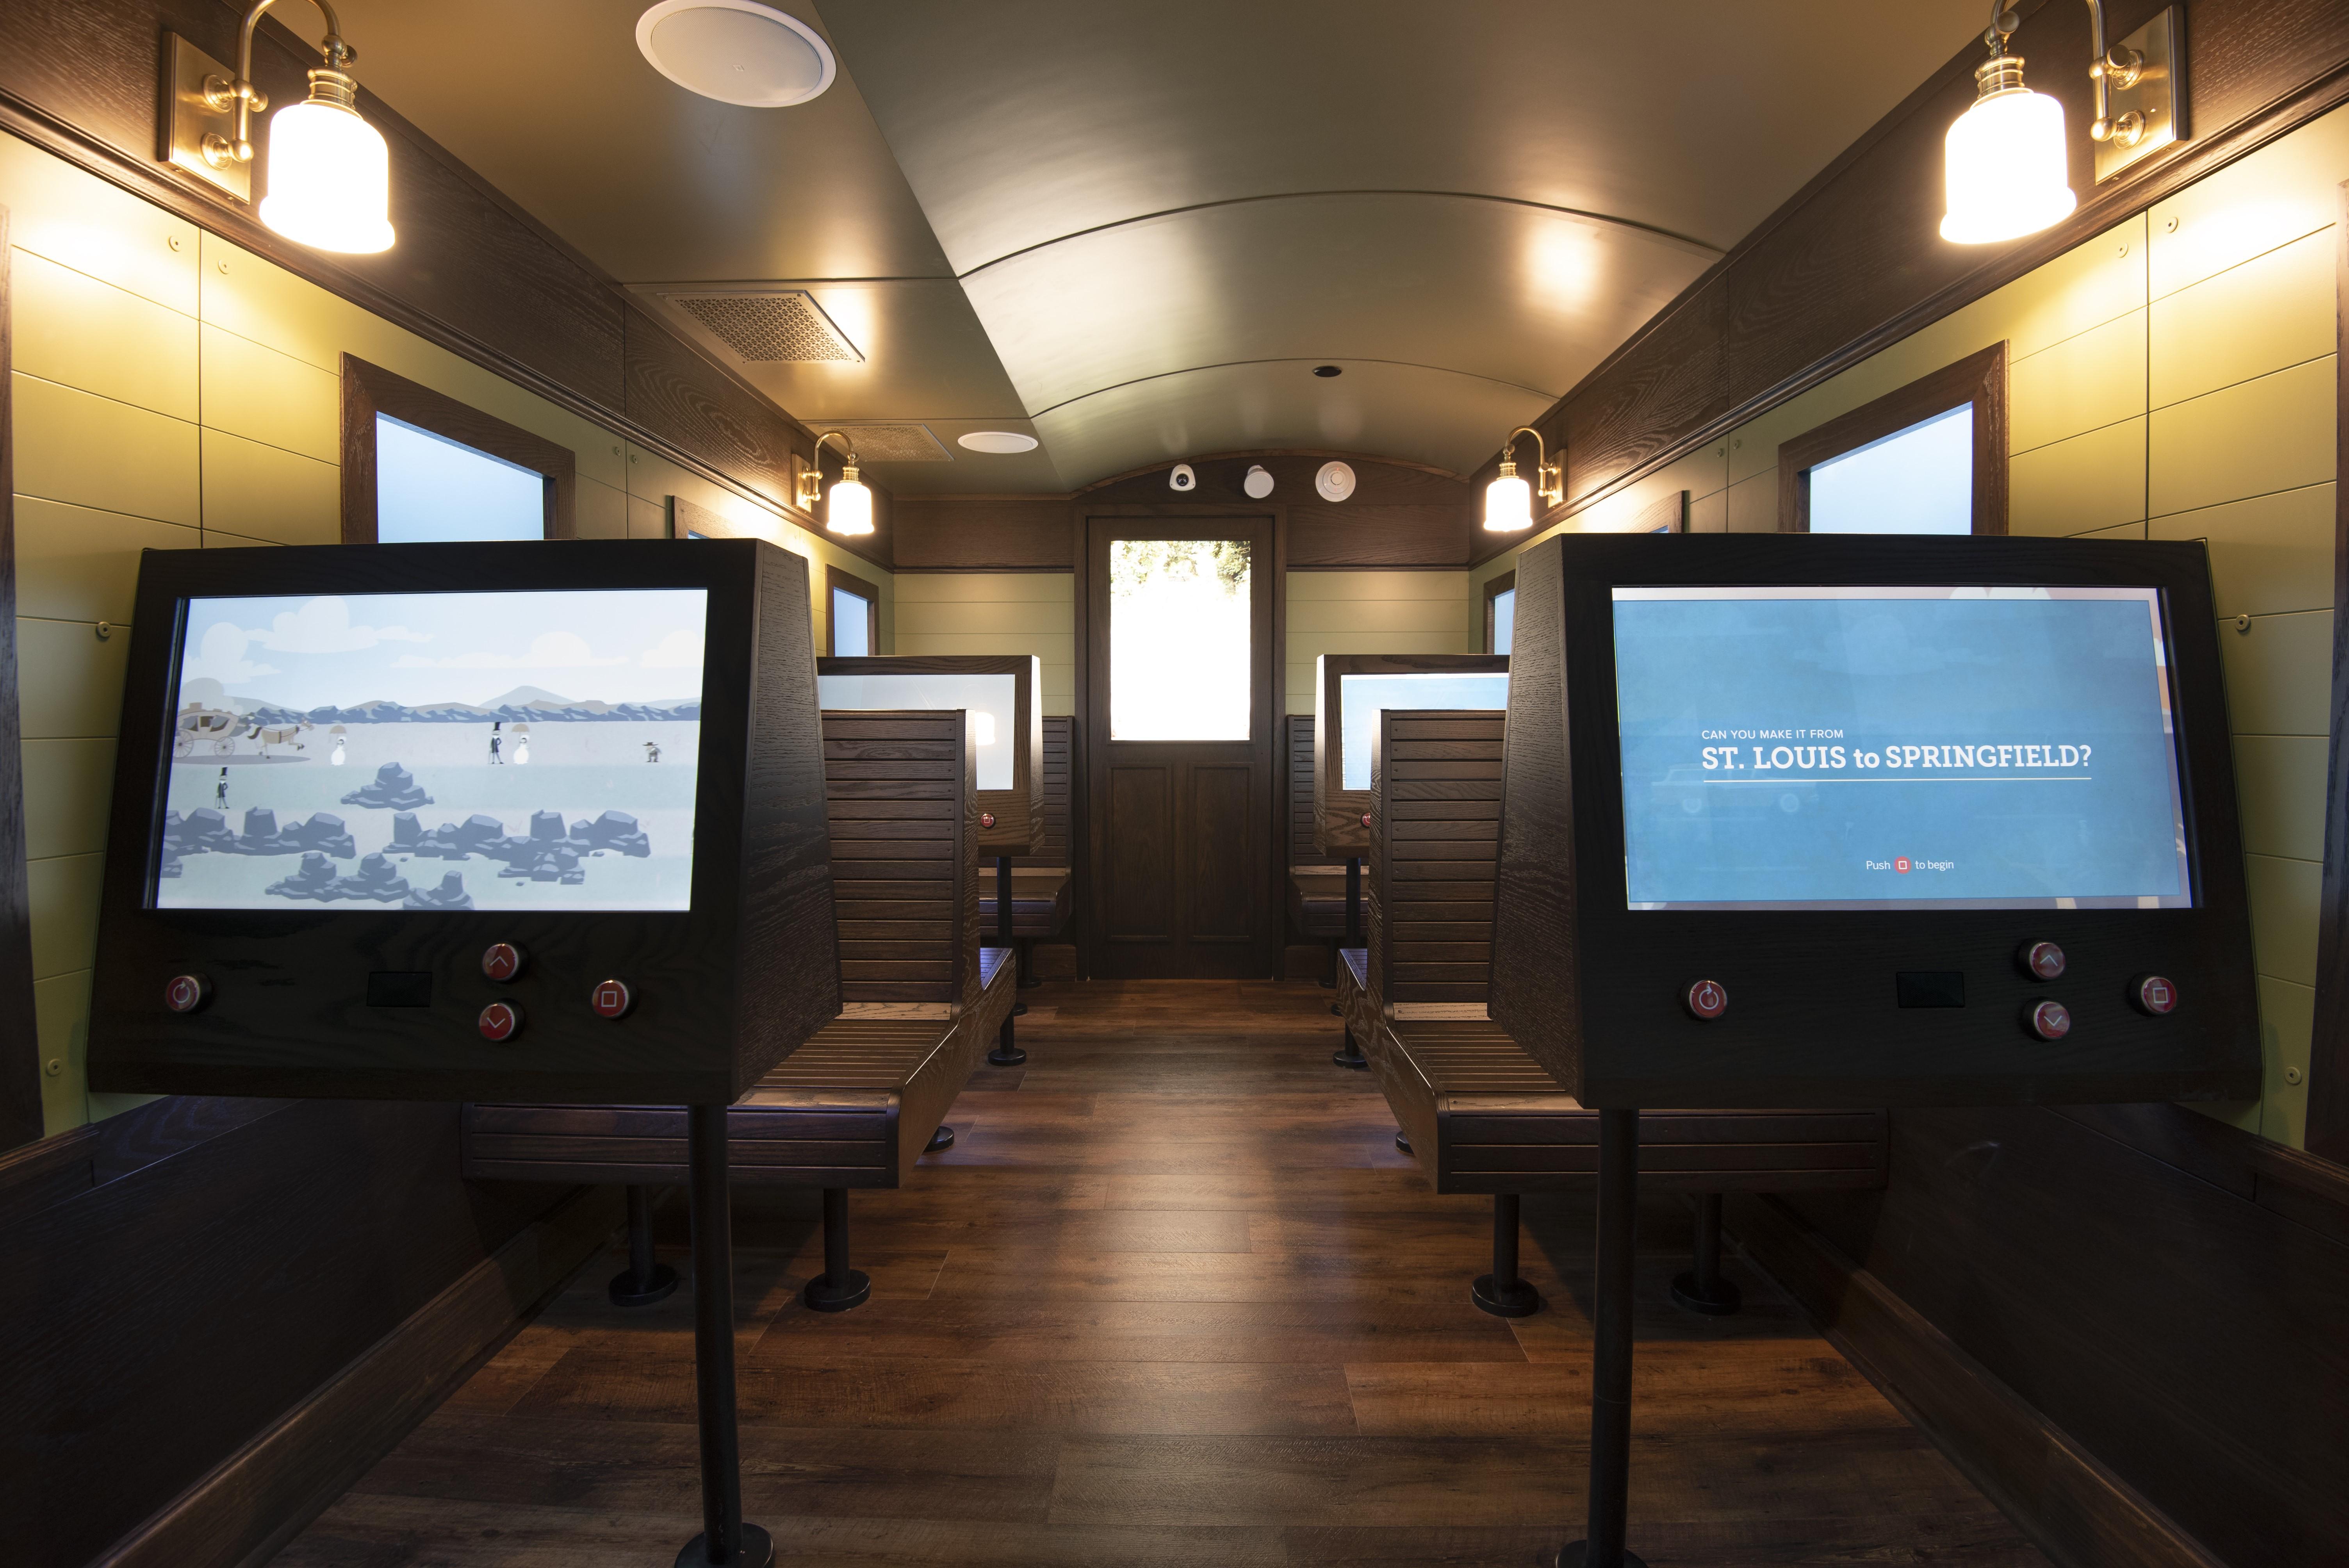 Play transportation games inside the Frisco Train